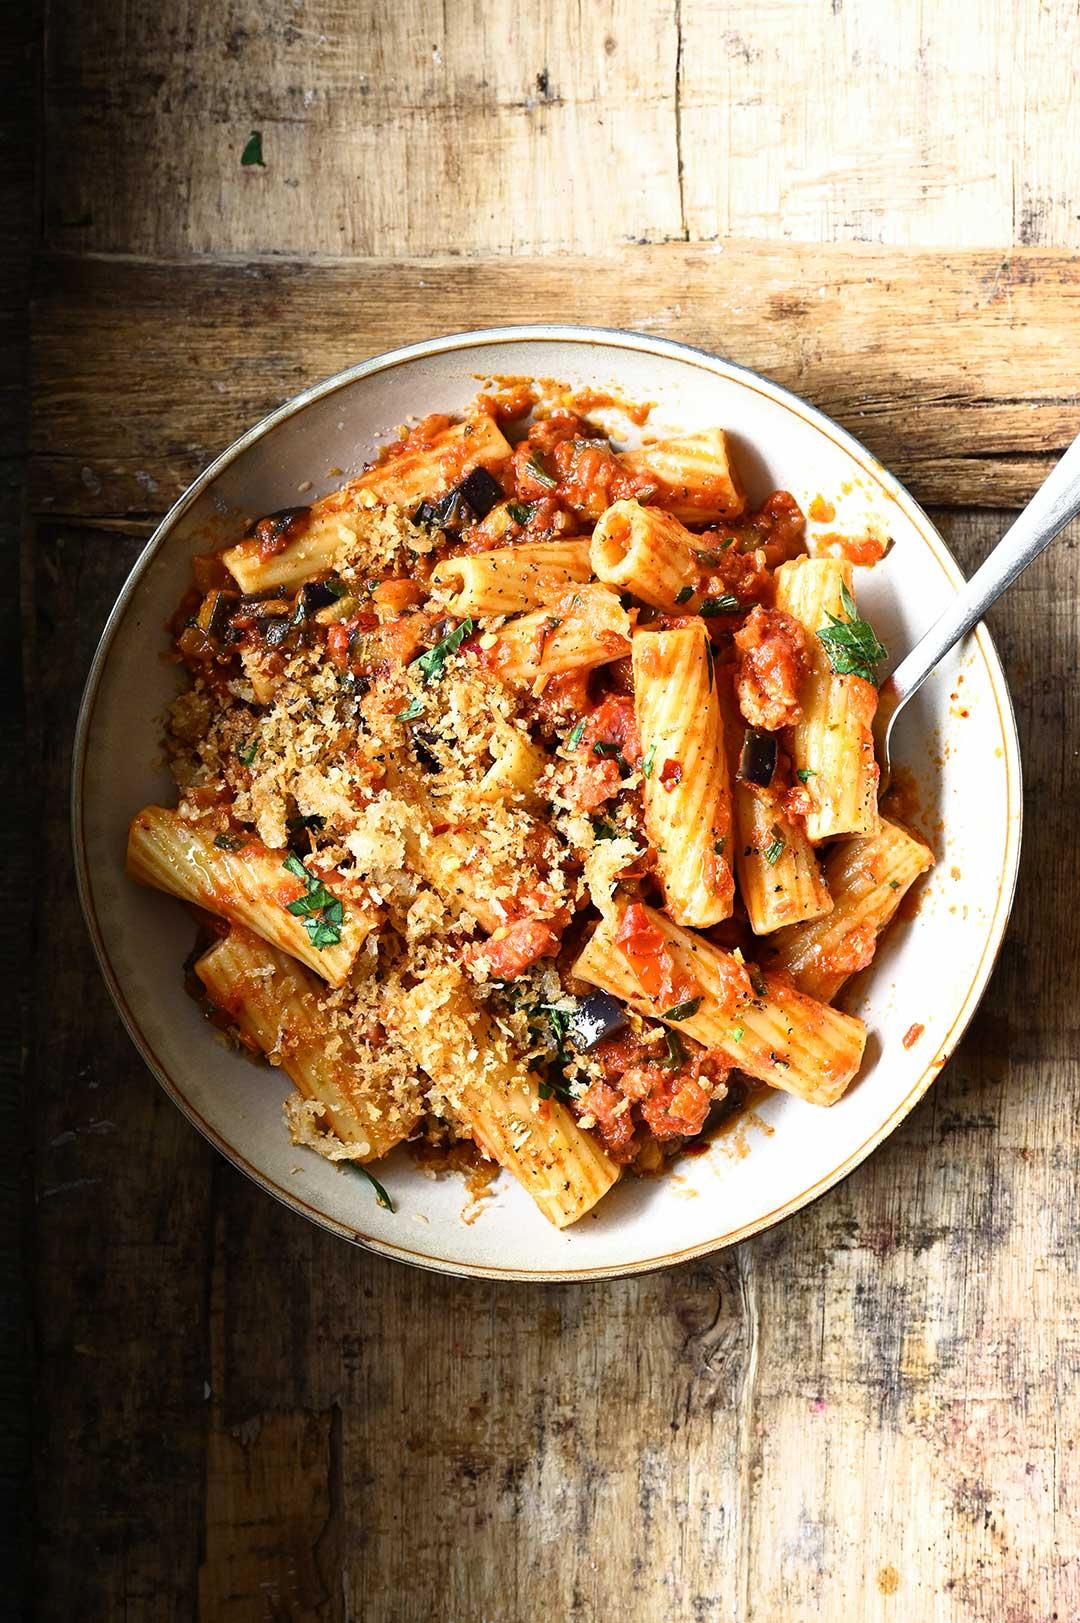 serving dumplings | Pasta met aubergine en spekjes